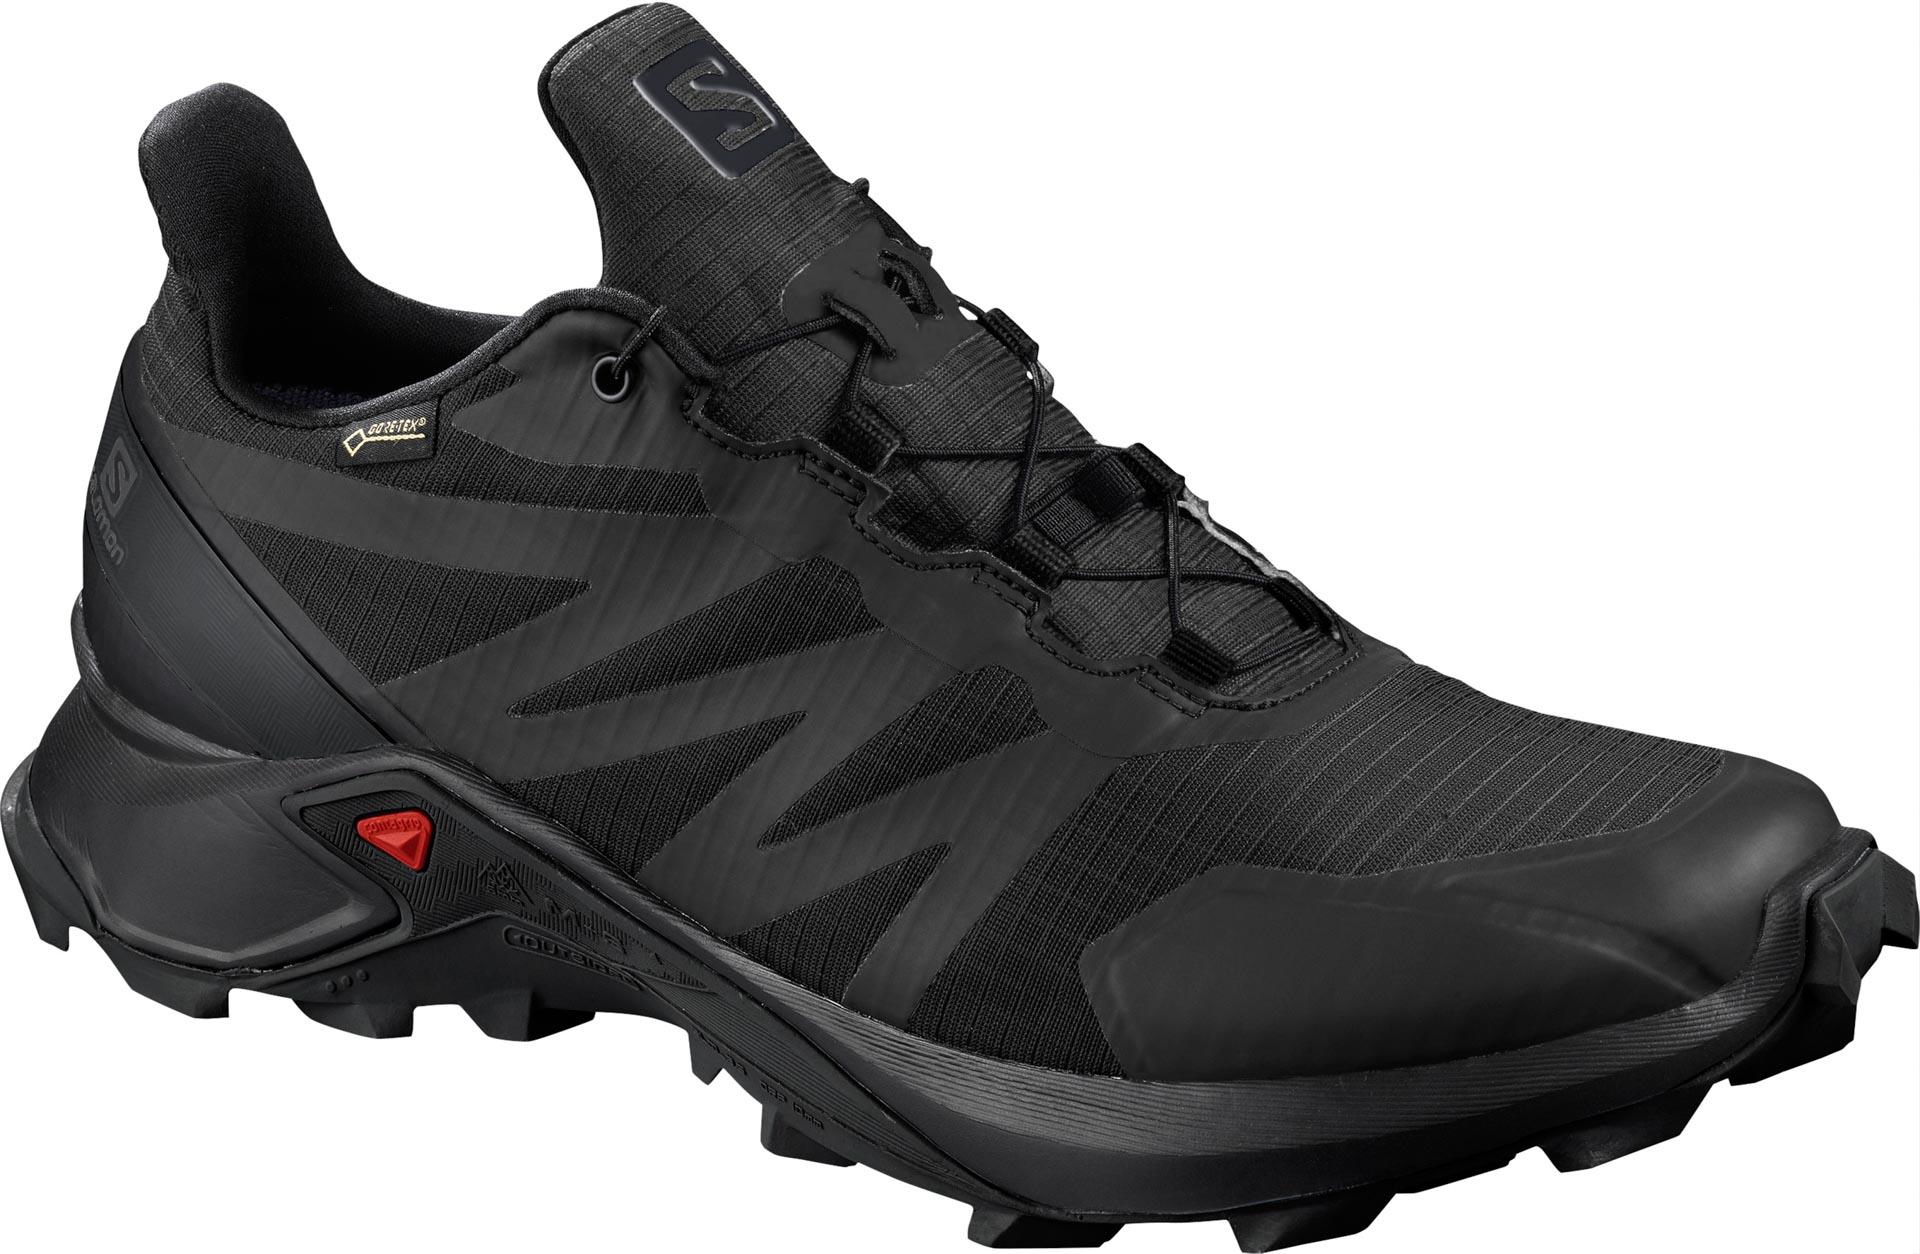 chaussures descentes salomon